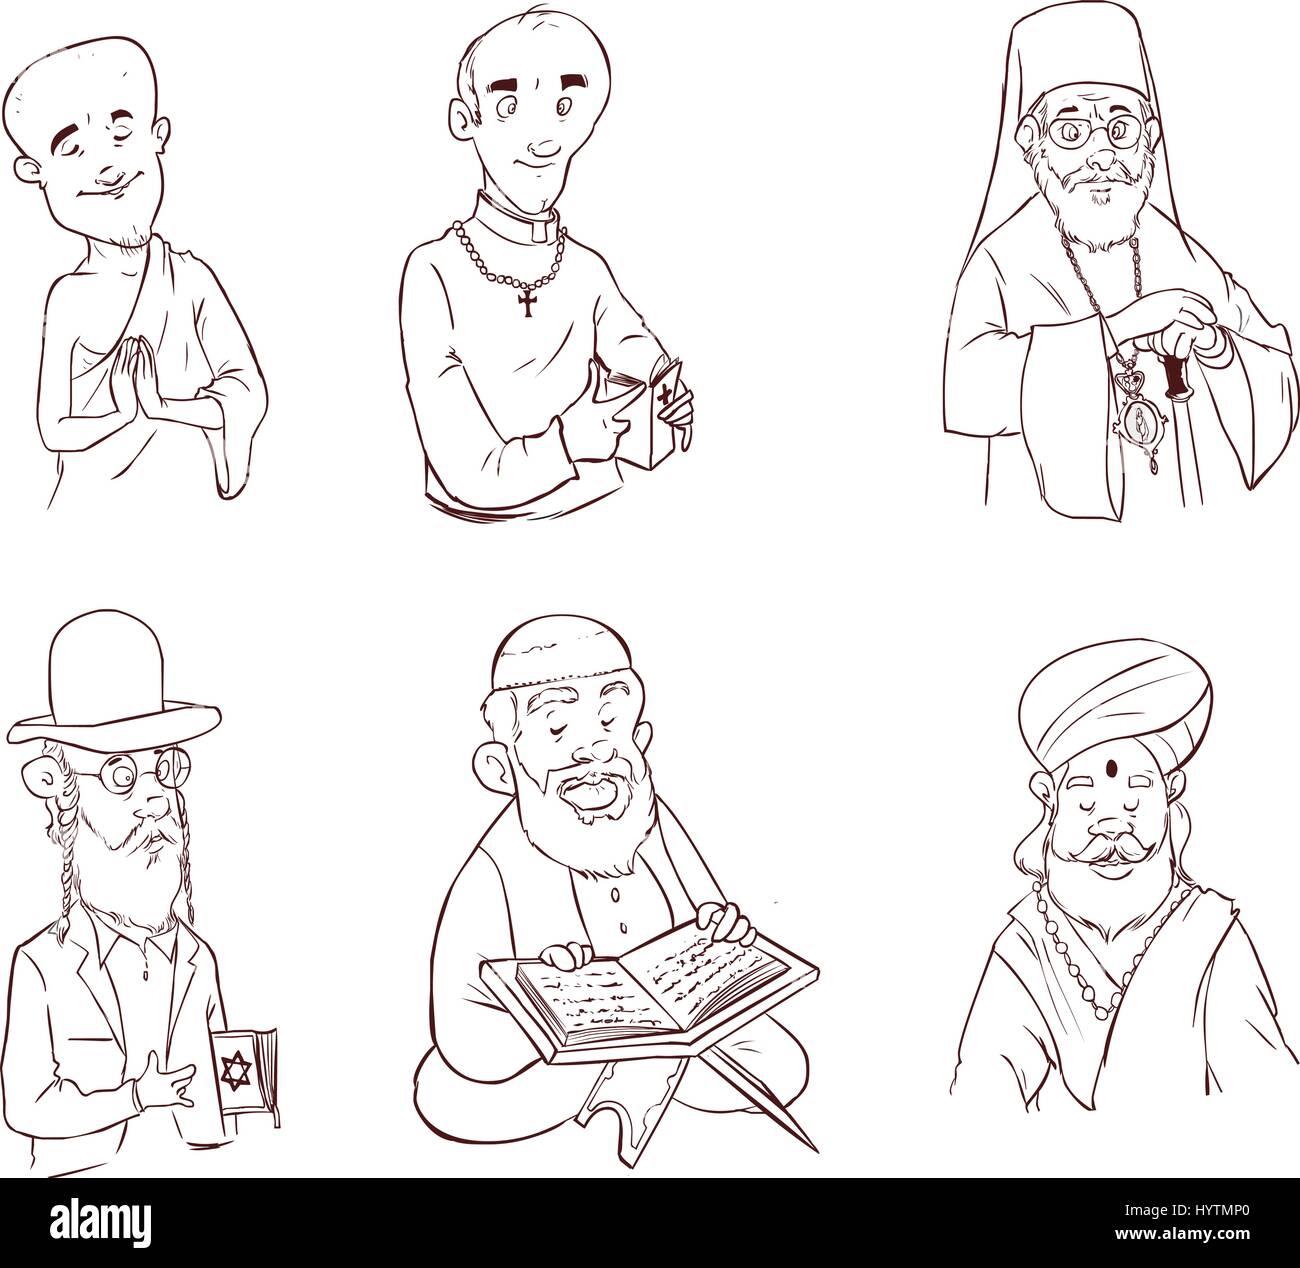 People of different religion in traditional clothing. Islam, judaism, buddhism, orthodox, catholic, hinduism illustration - Stock Image